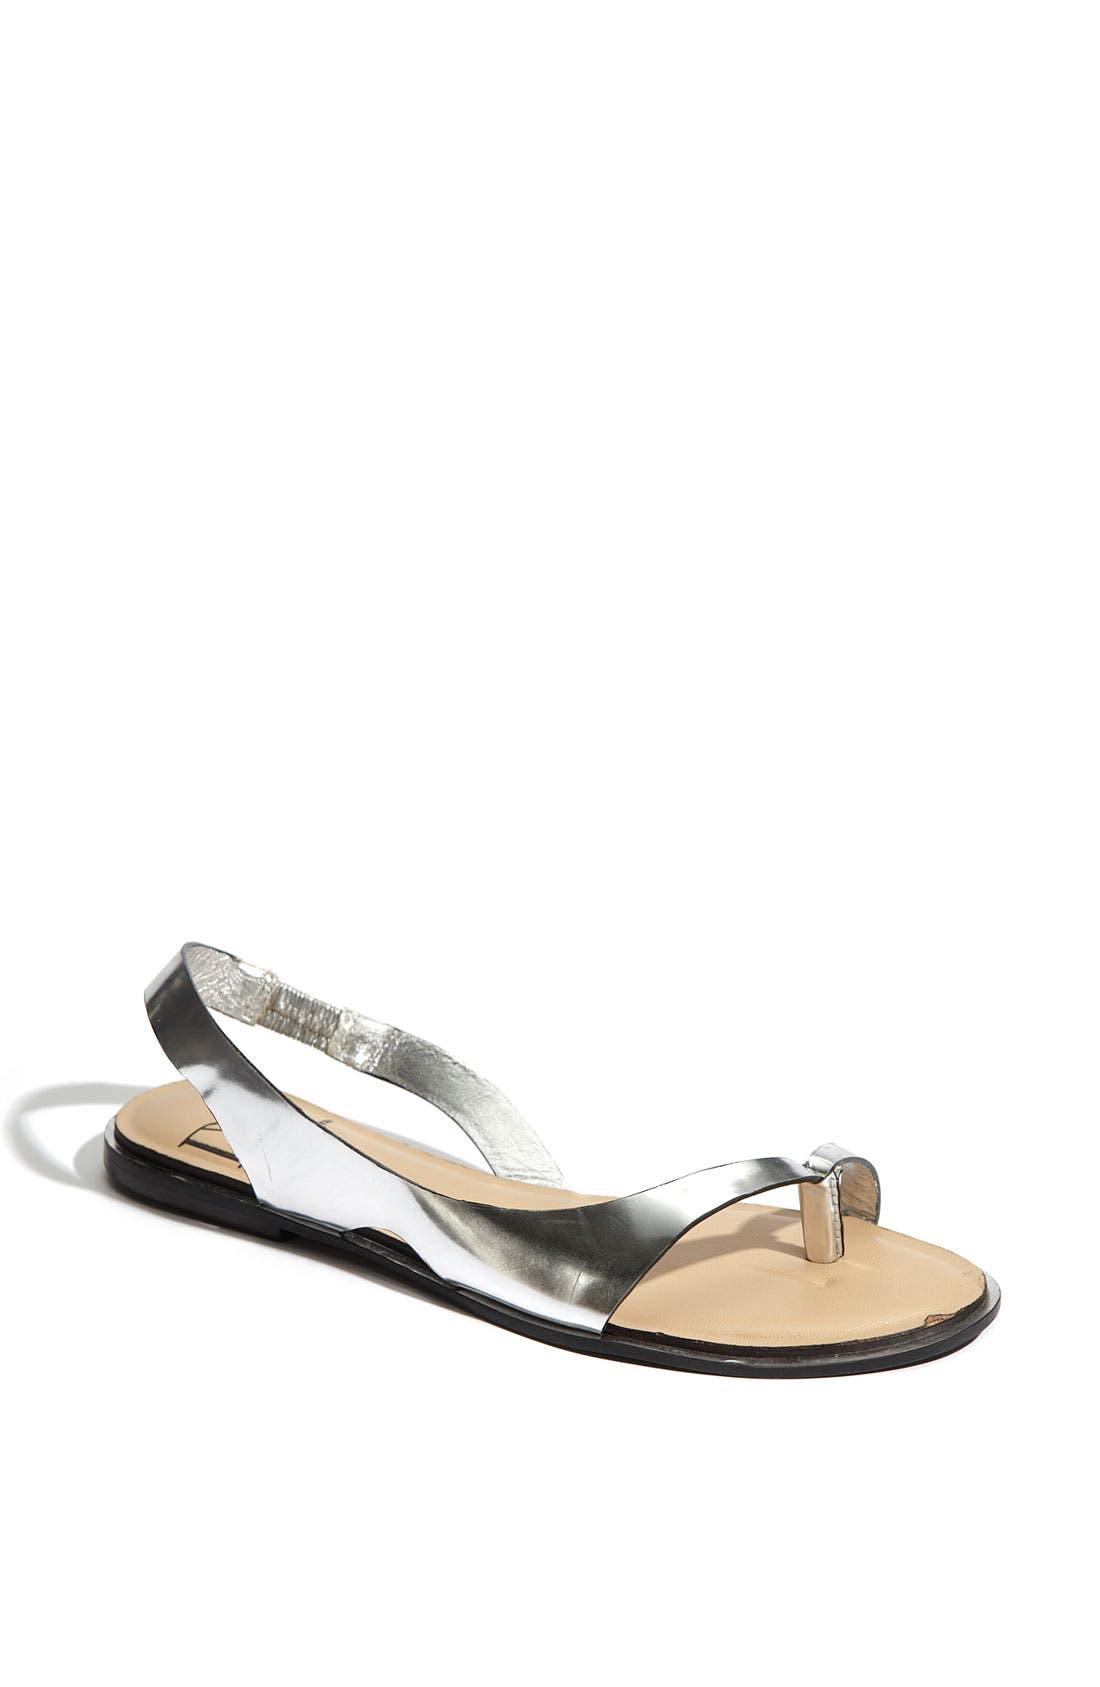 Main Image - Diane von Furstenberg 'Kaiti' Slingback Sandal